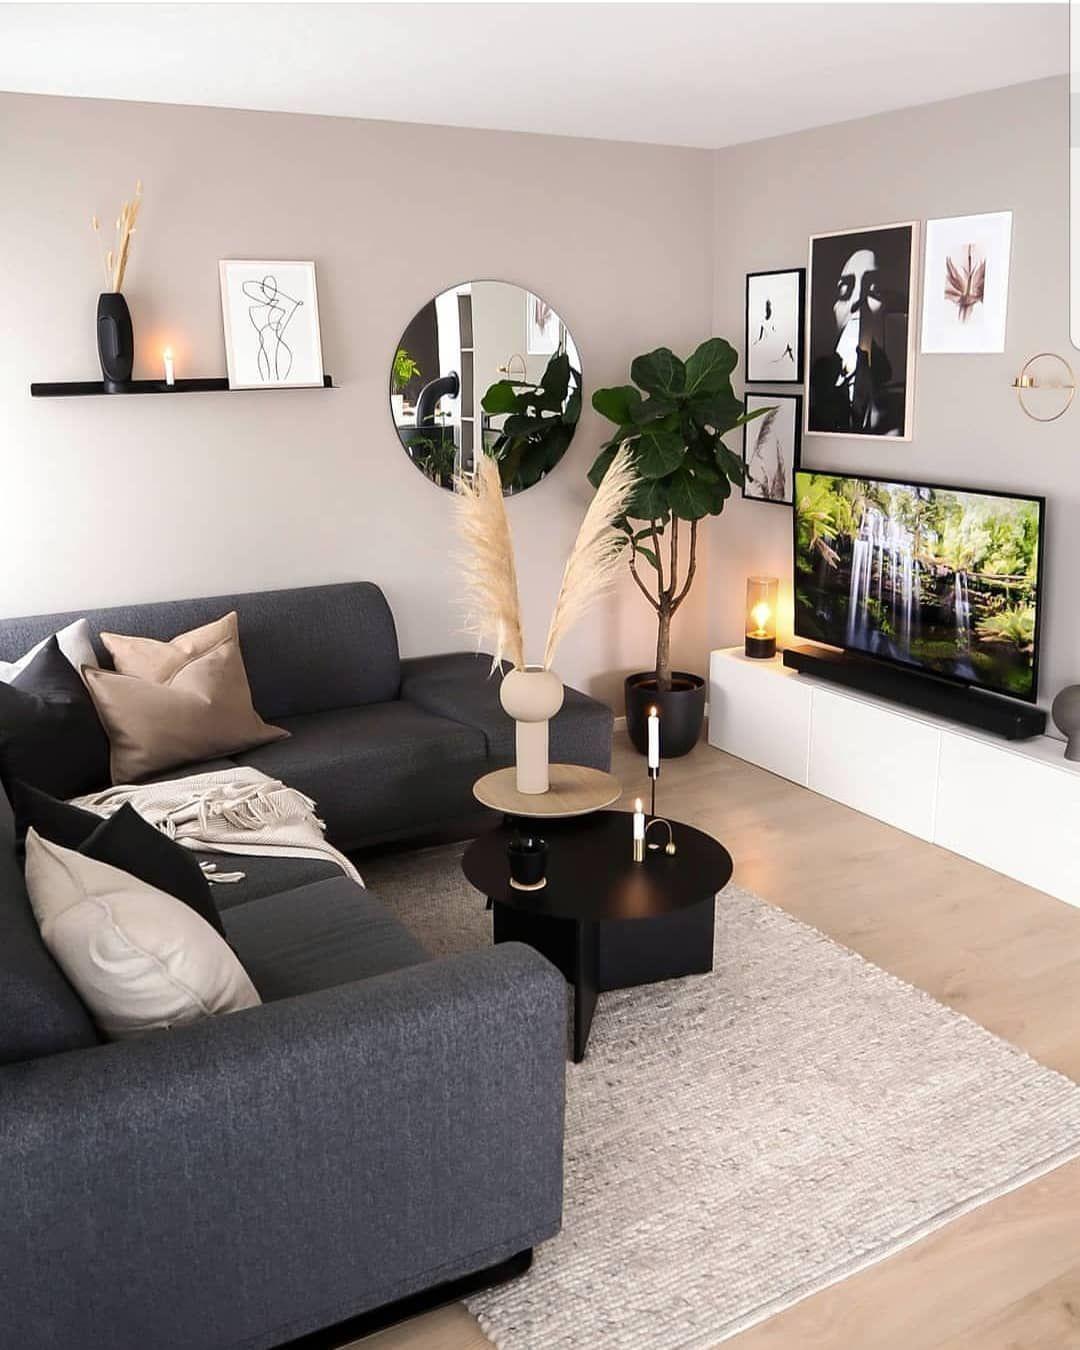 Inspire Me Home Decor Instagram Home Inspiration Inspire Ins Small Apartment Decorating Living Room Apartment Decorating Living Living Room Decor Apartment Home decor living room apartment